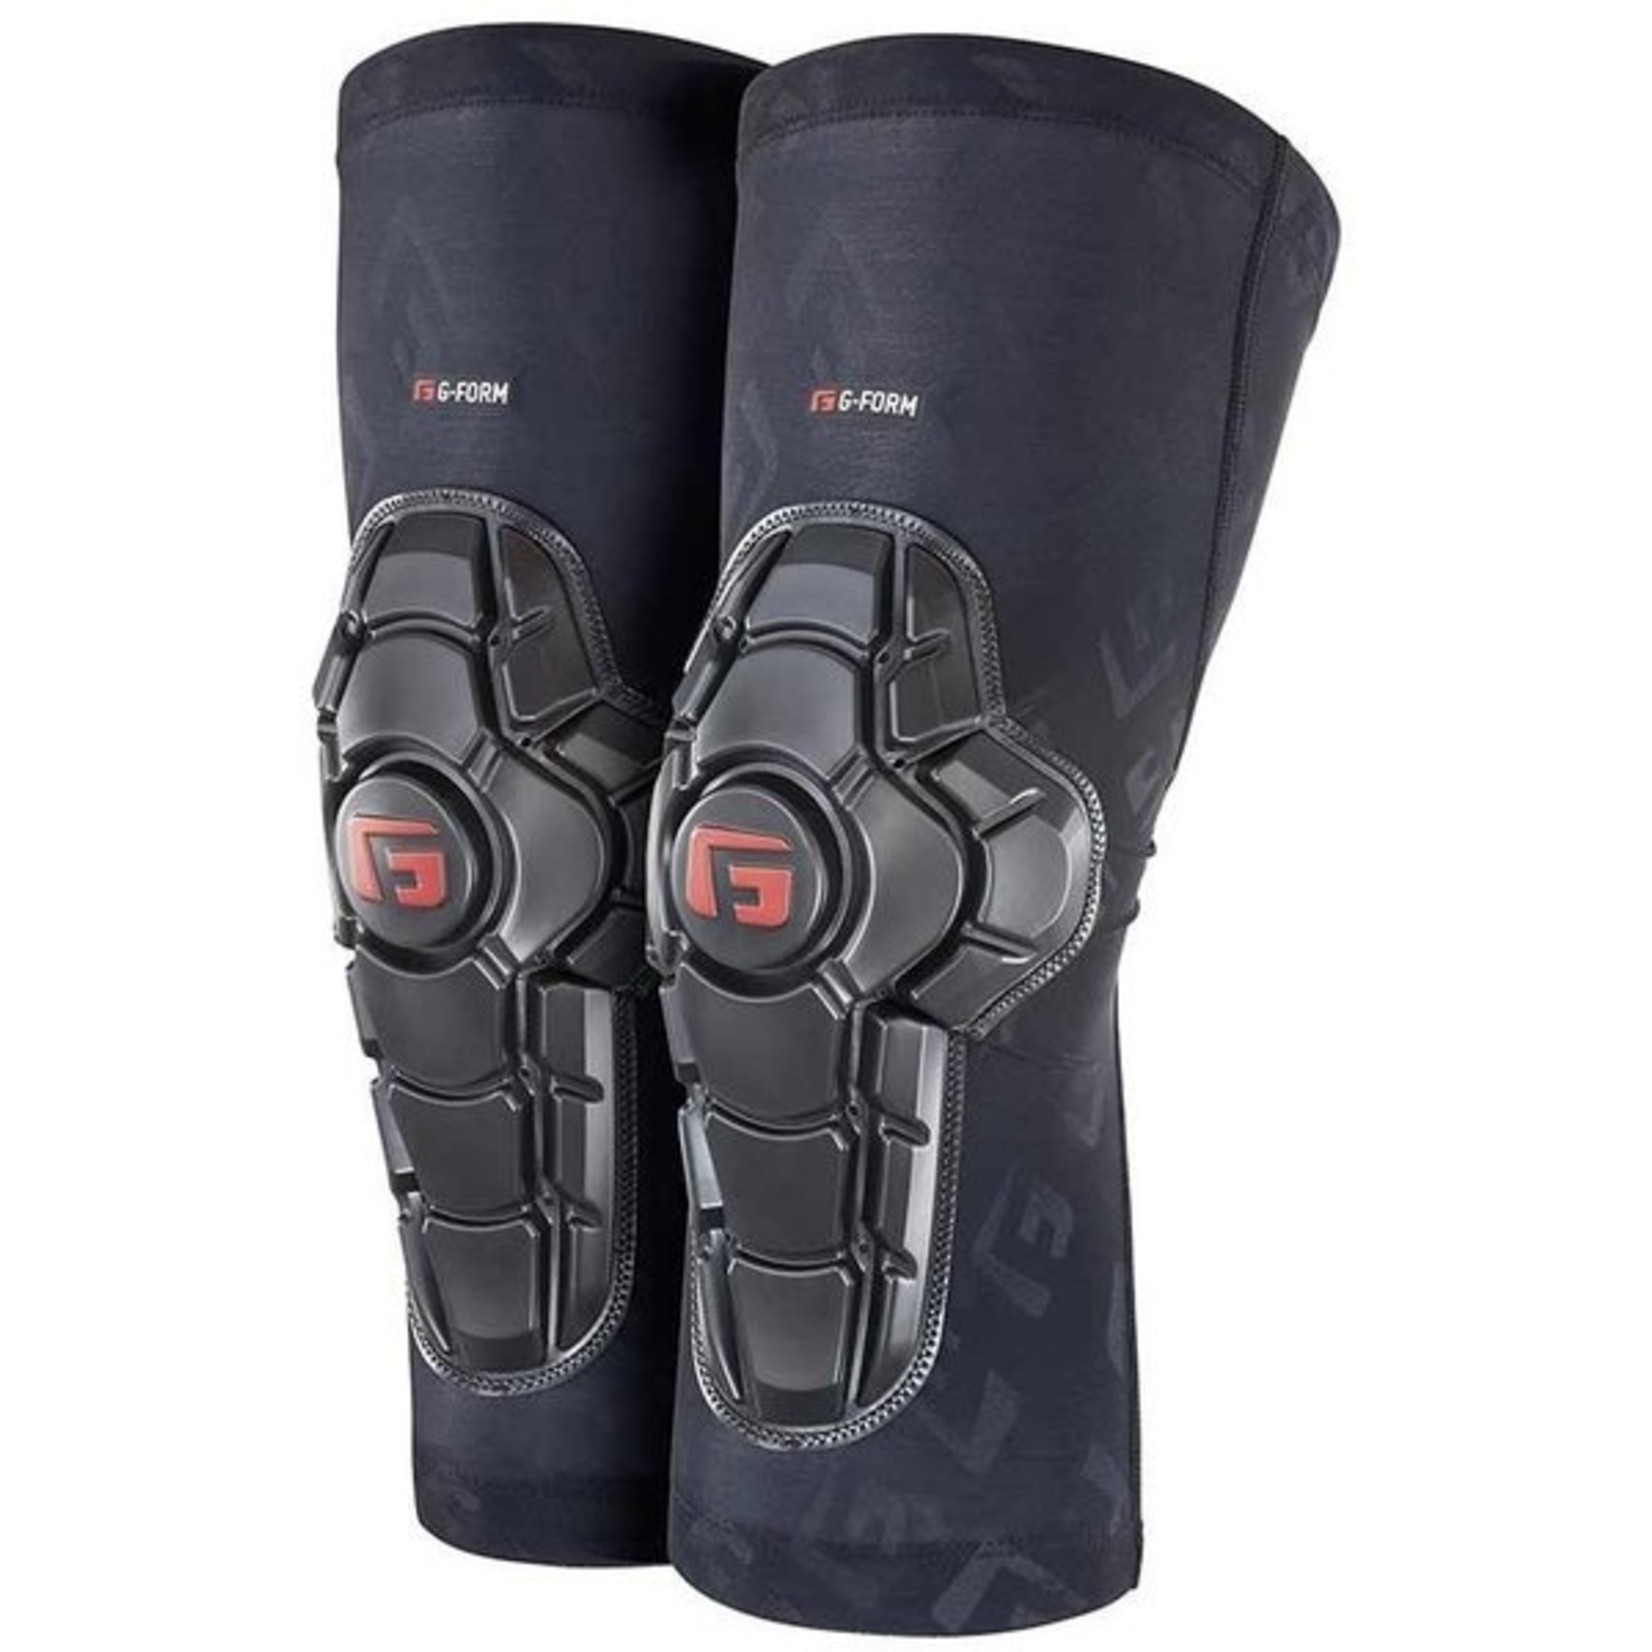 G-Form G-Form, Youth Pro-X2, Knee Pads, Black, LXL, Set